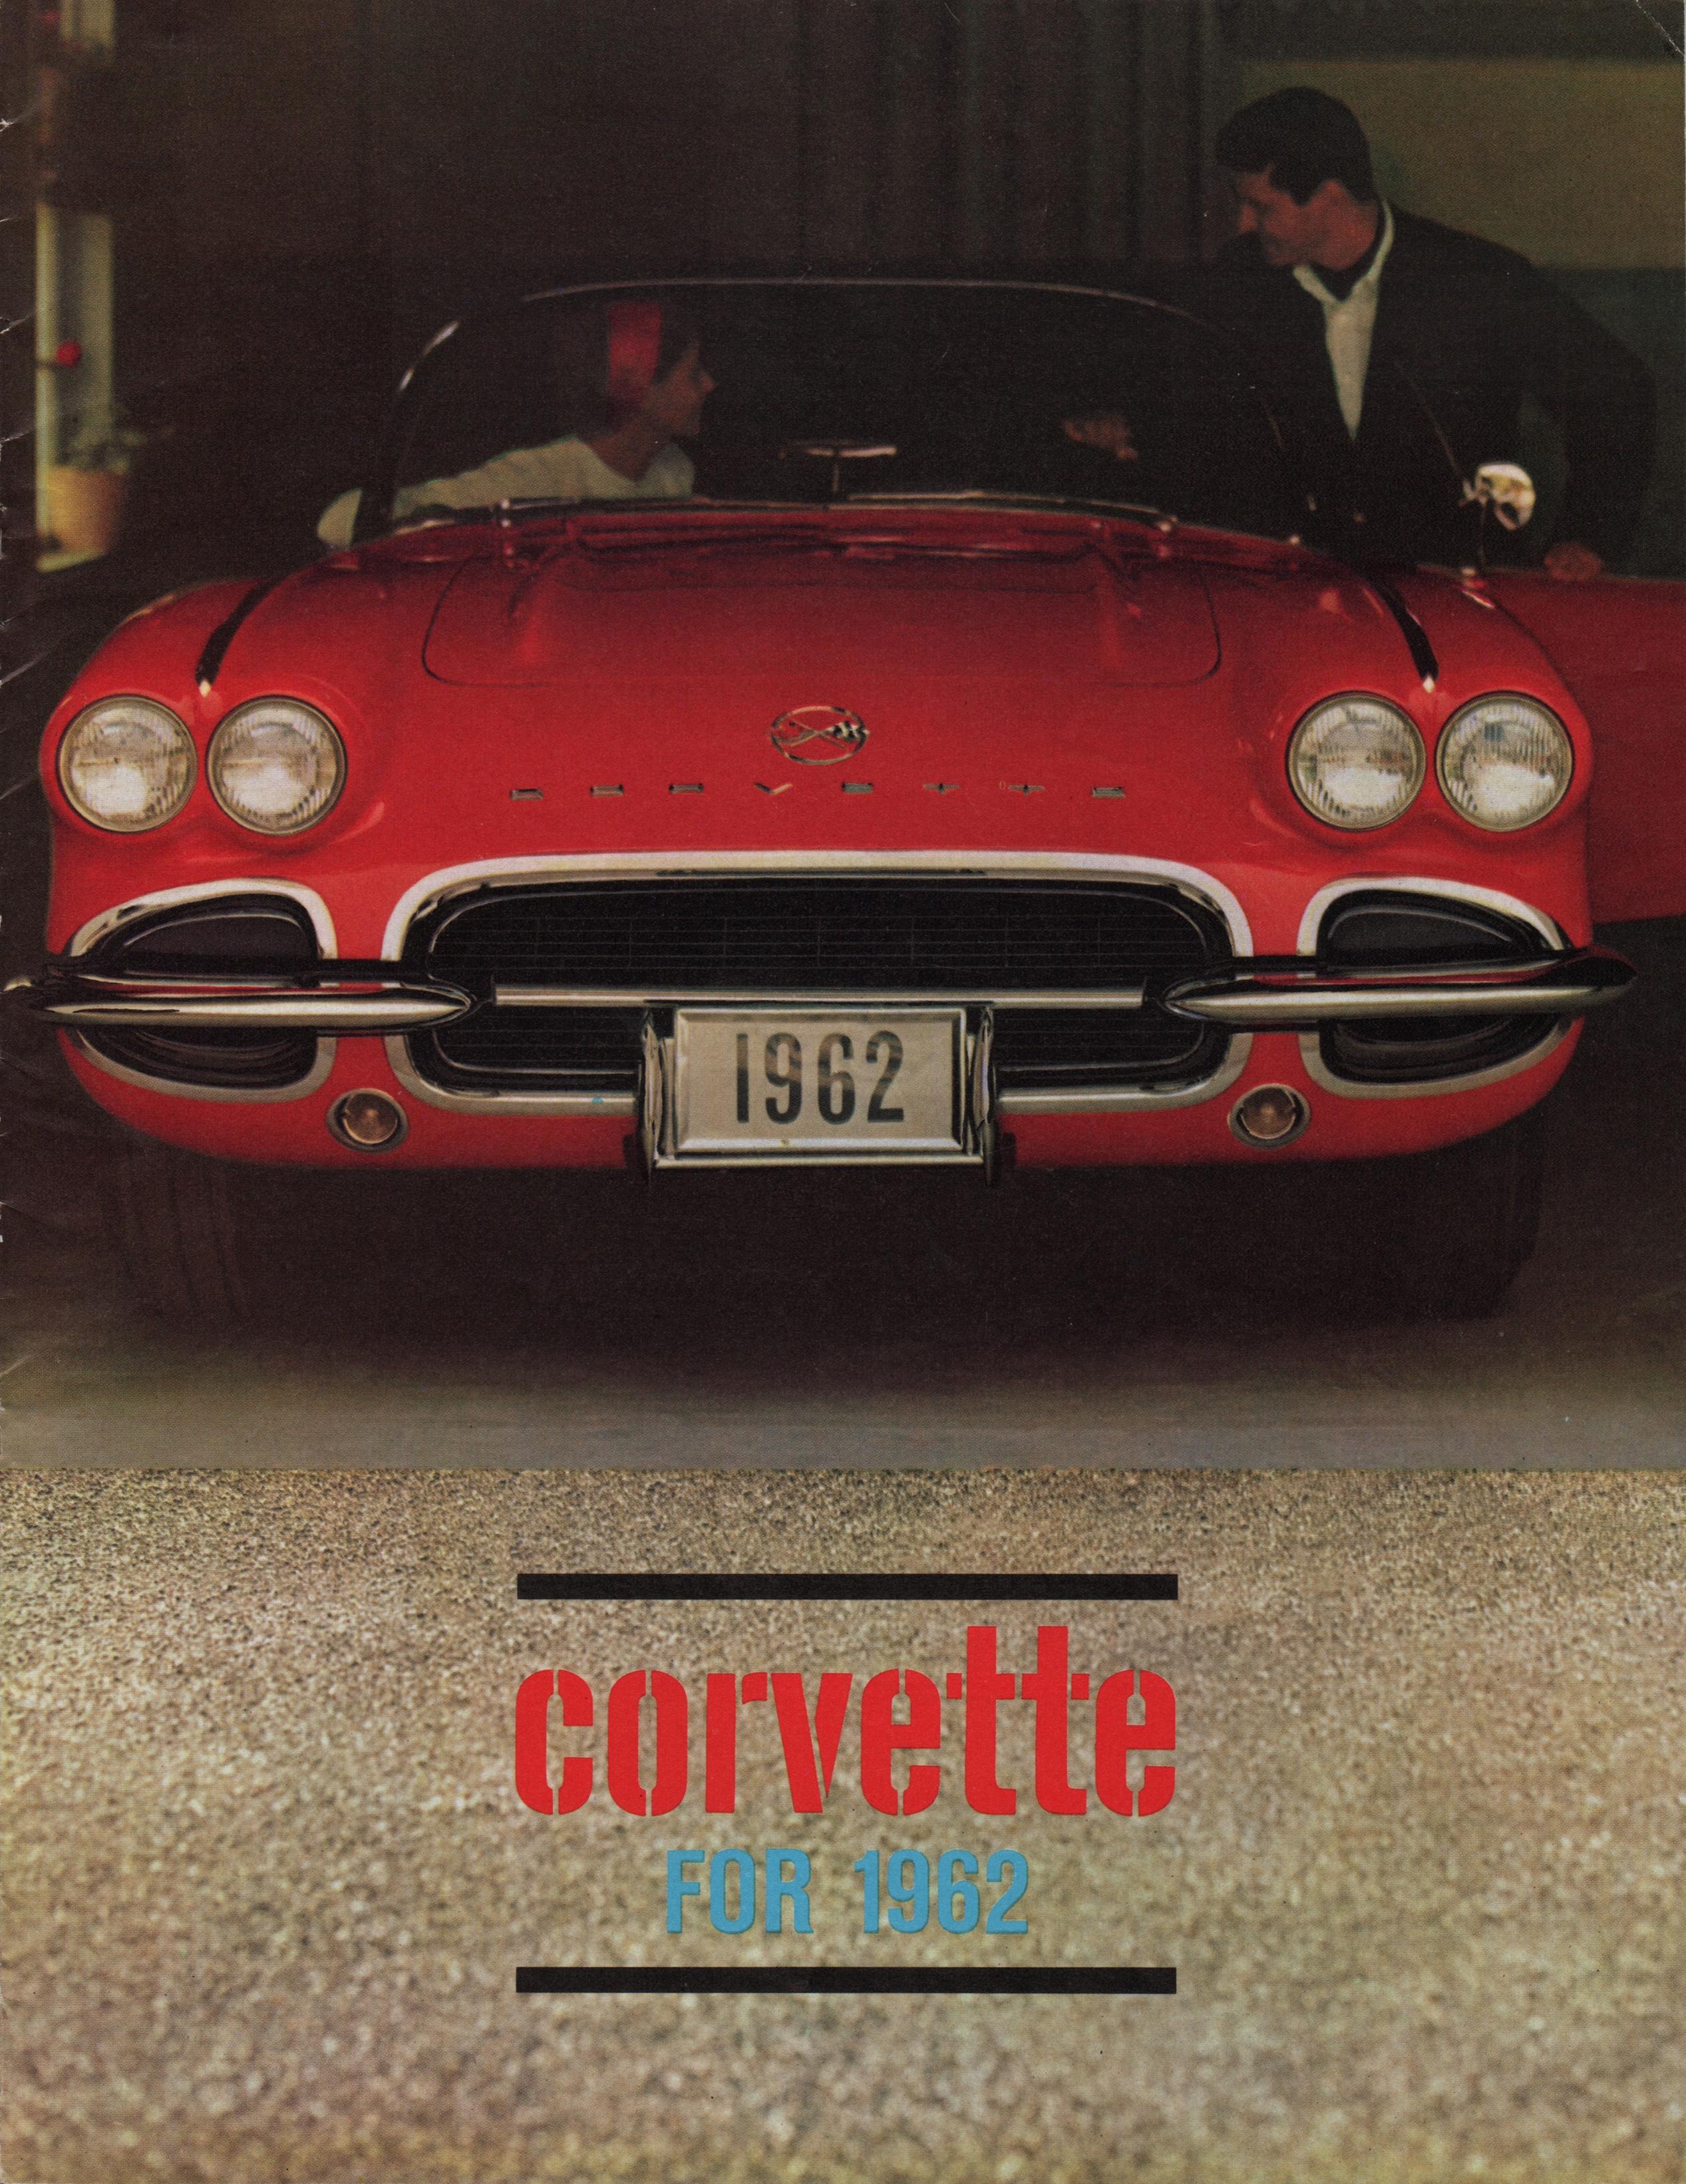 Gm 1962 Chevrolet Corvette Sales Brochure